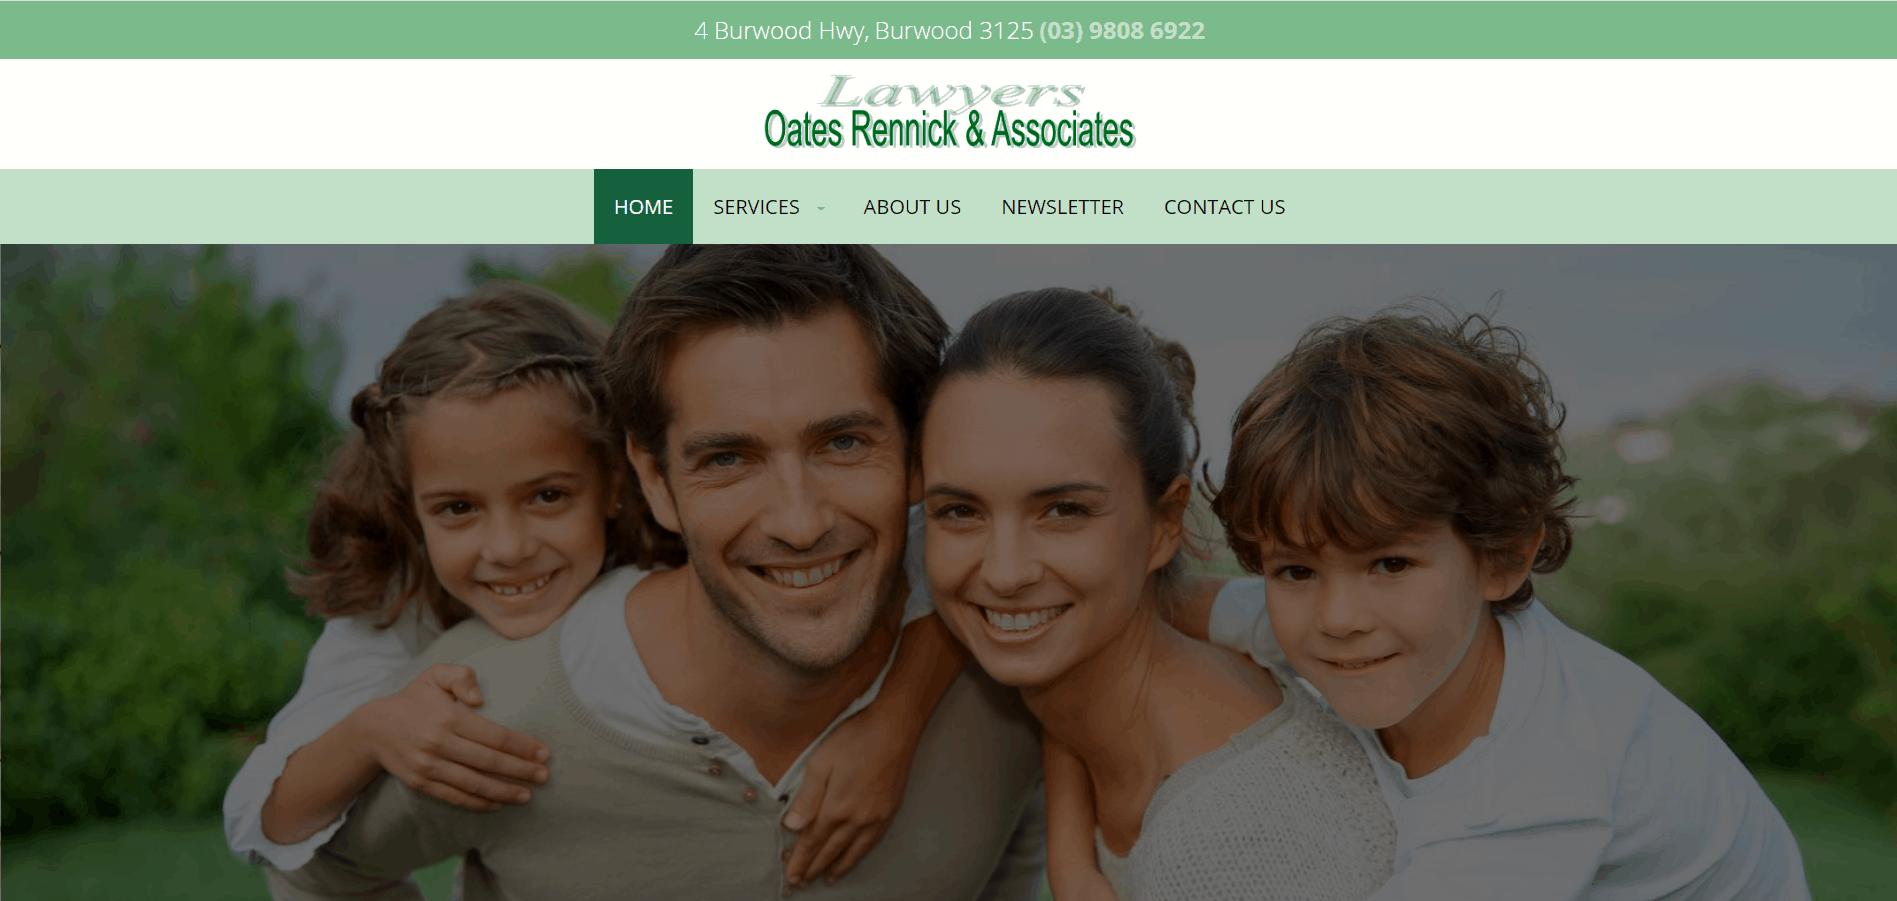 Oates Rennick & Associates